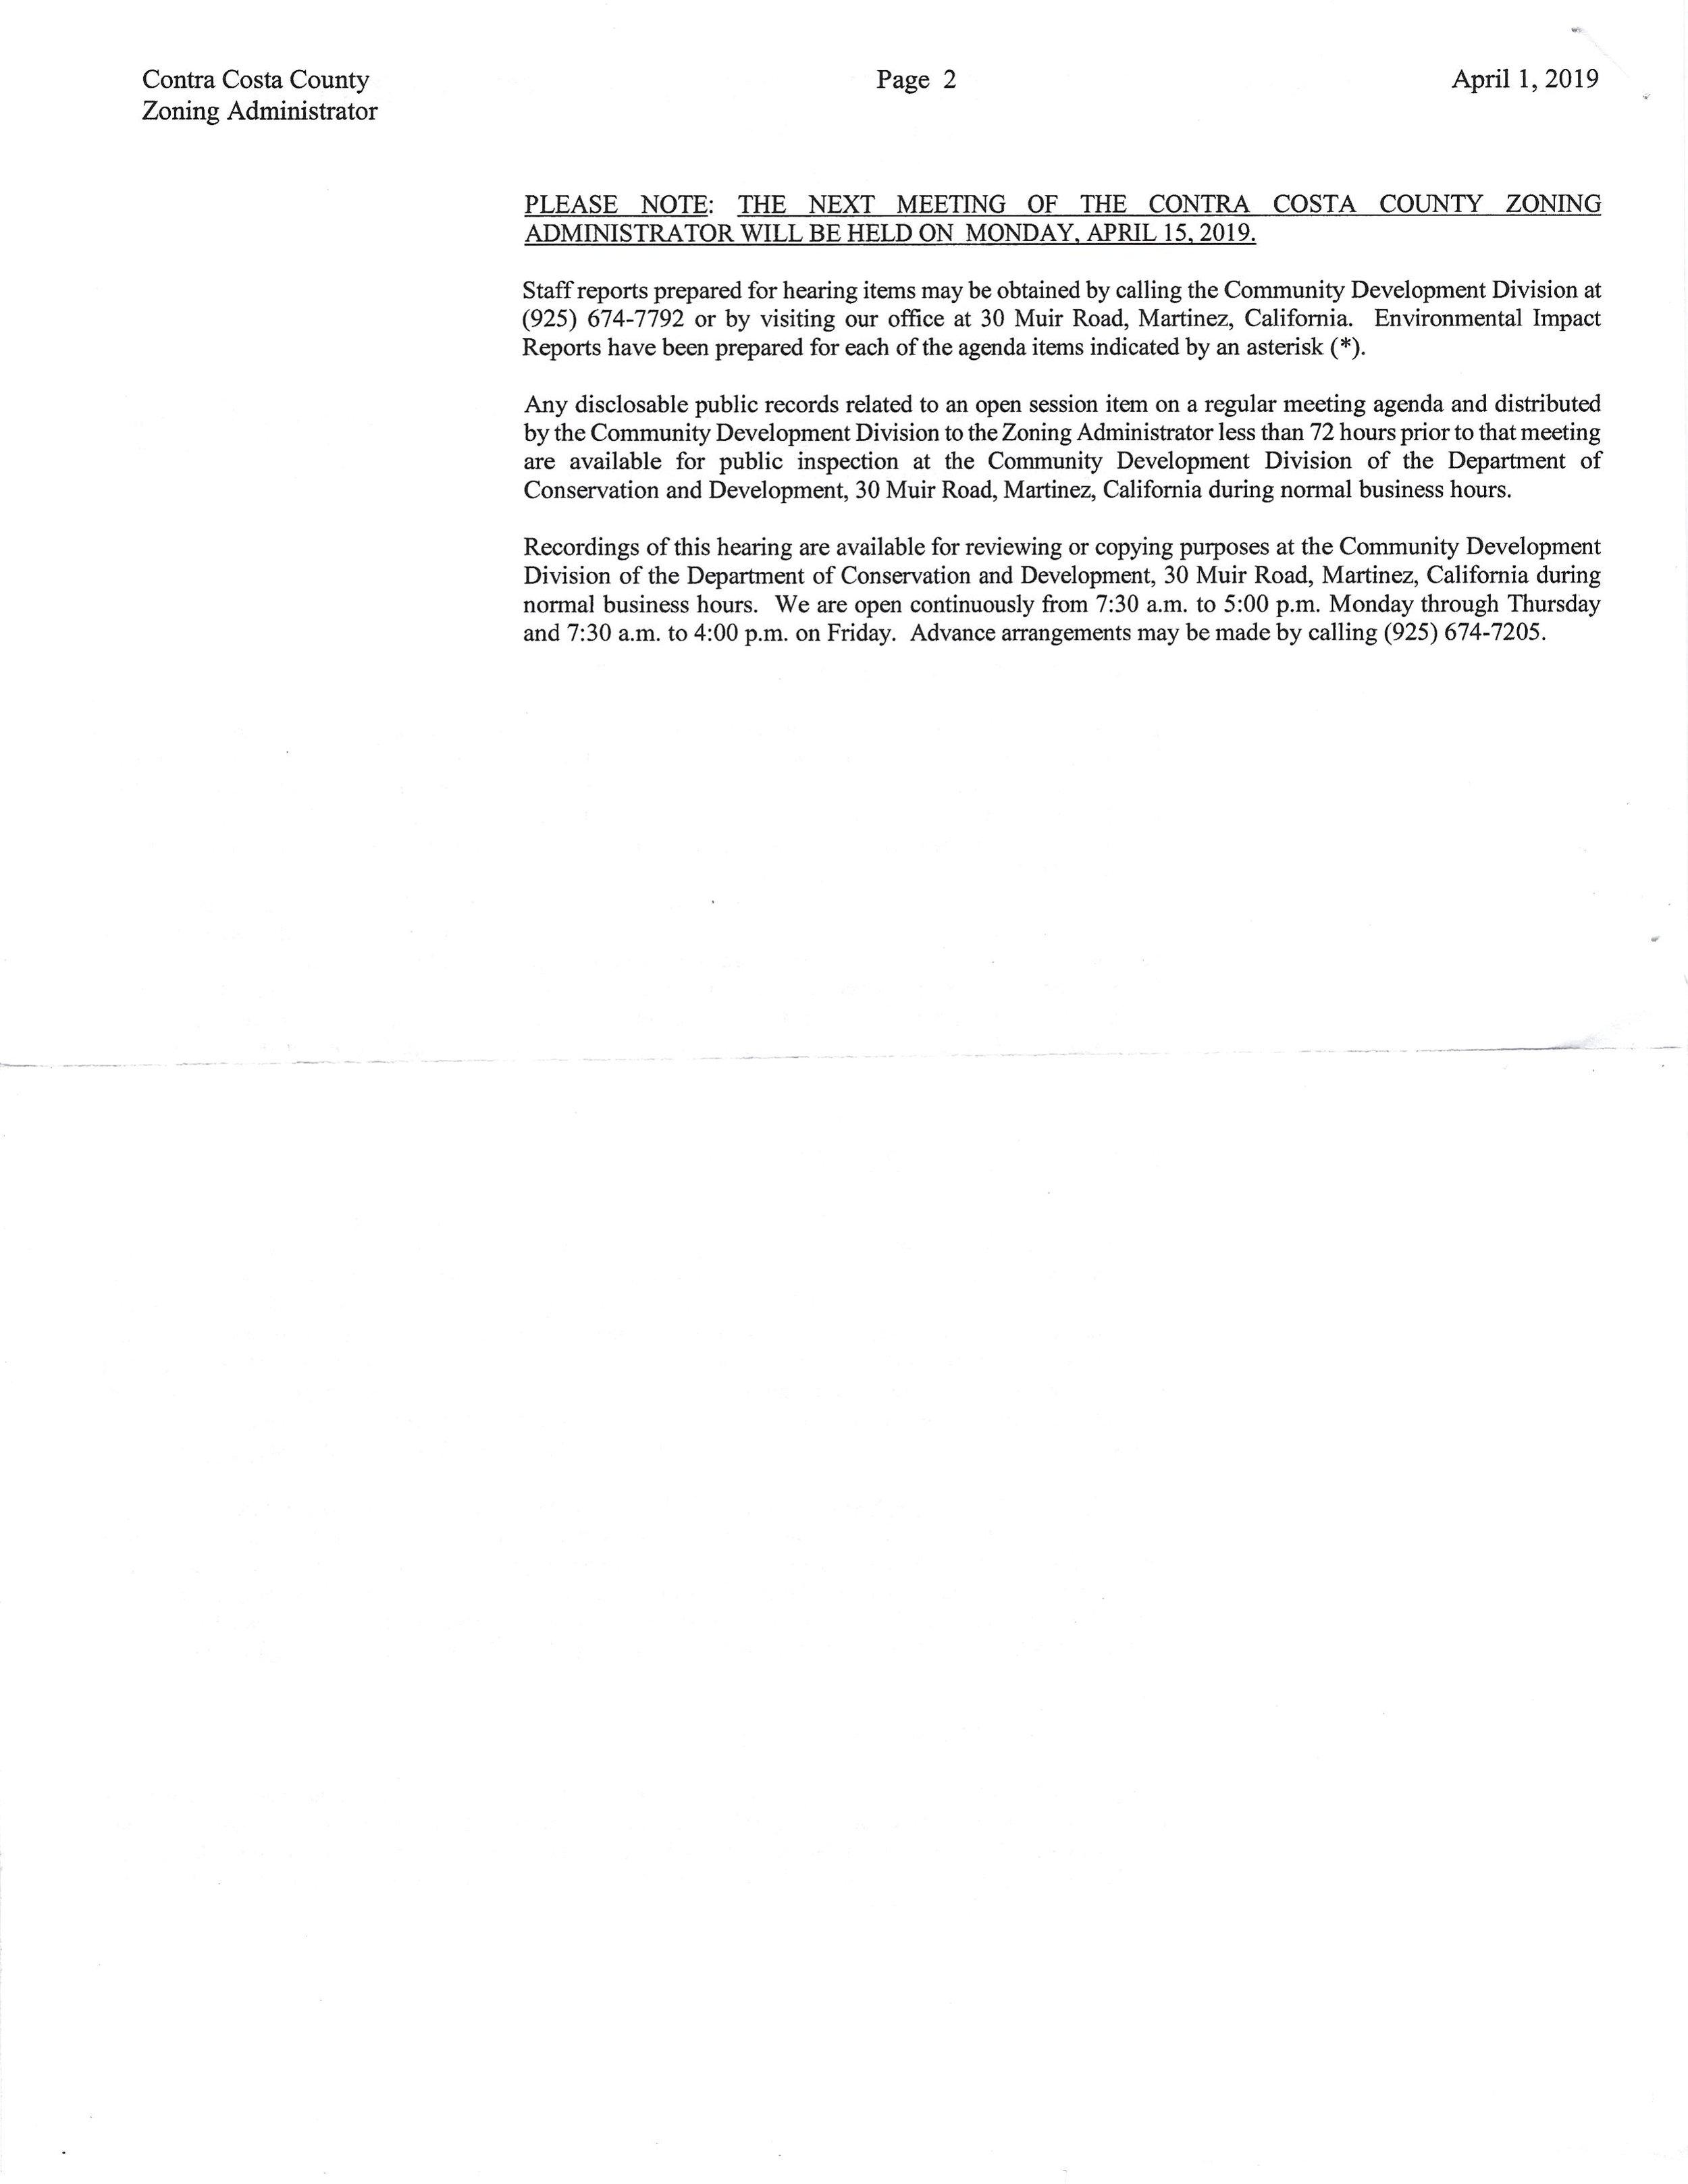 ESMAC Agenda 4.10.19_12.jpg